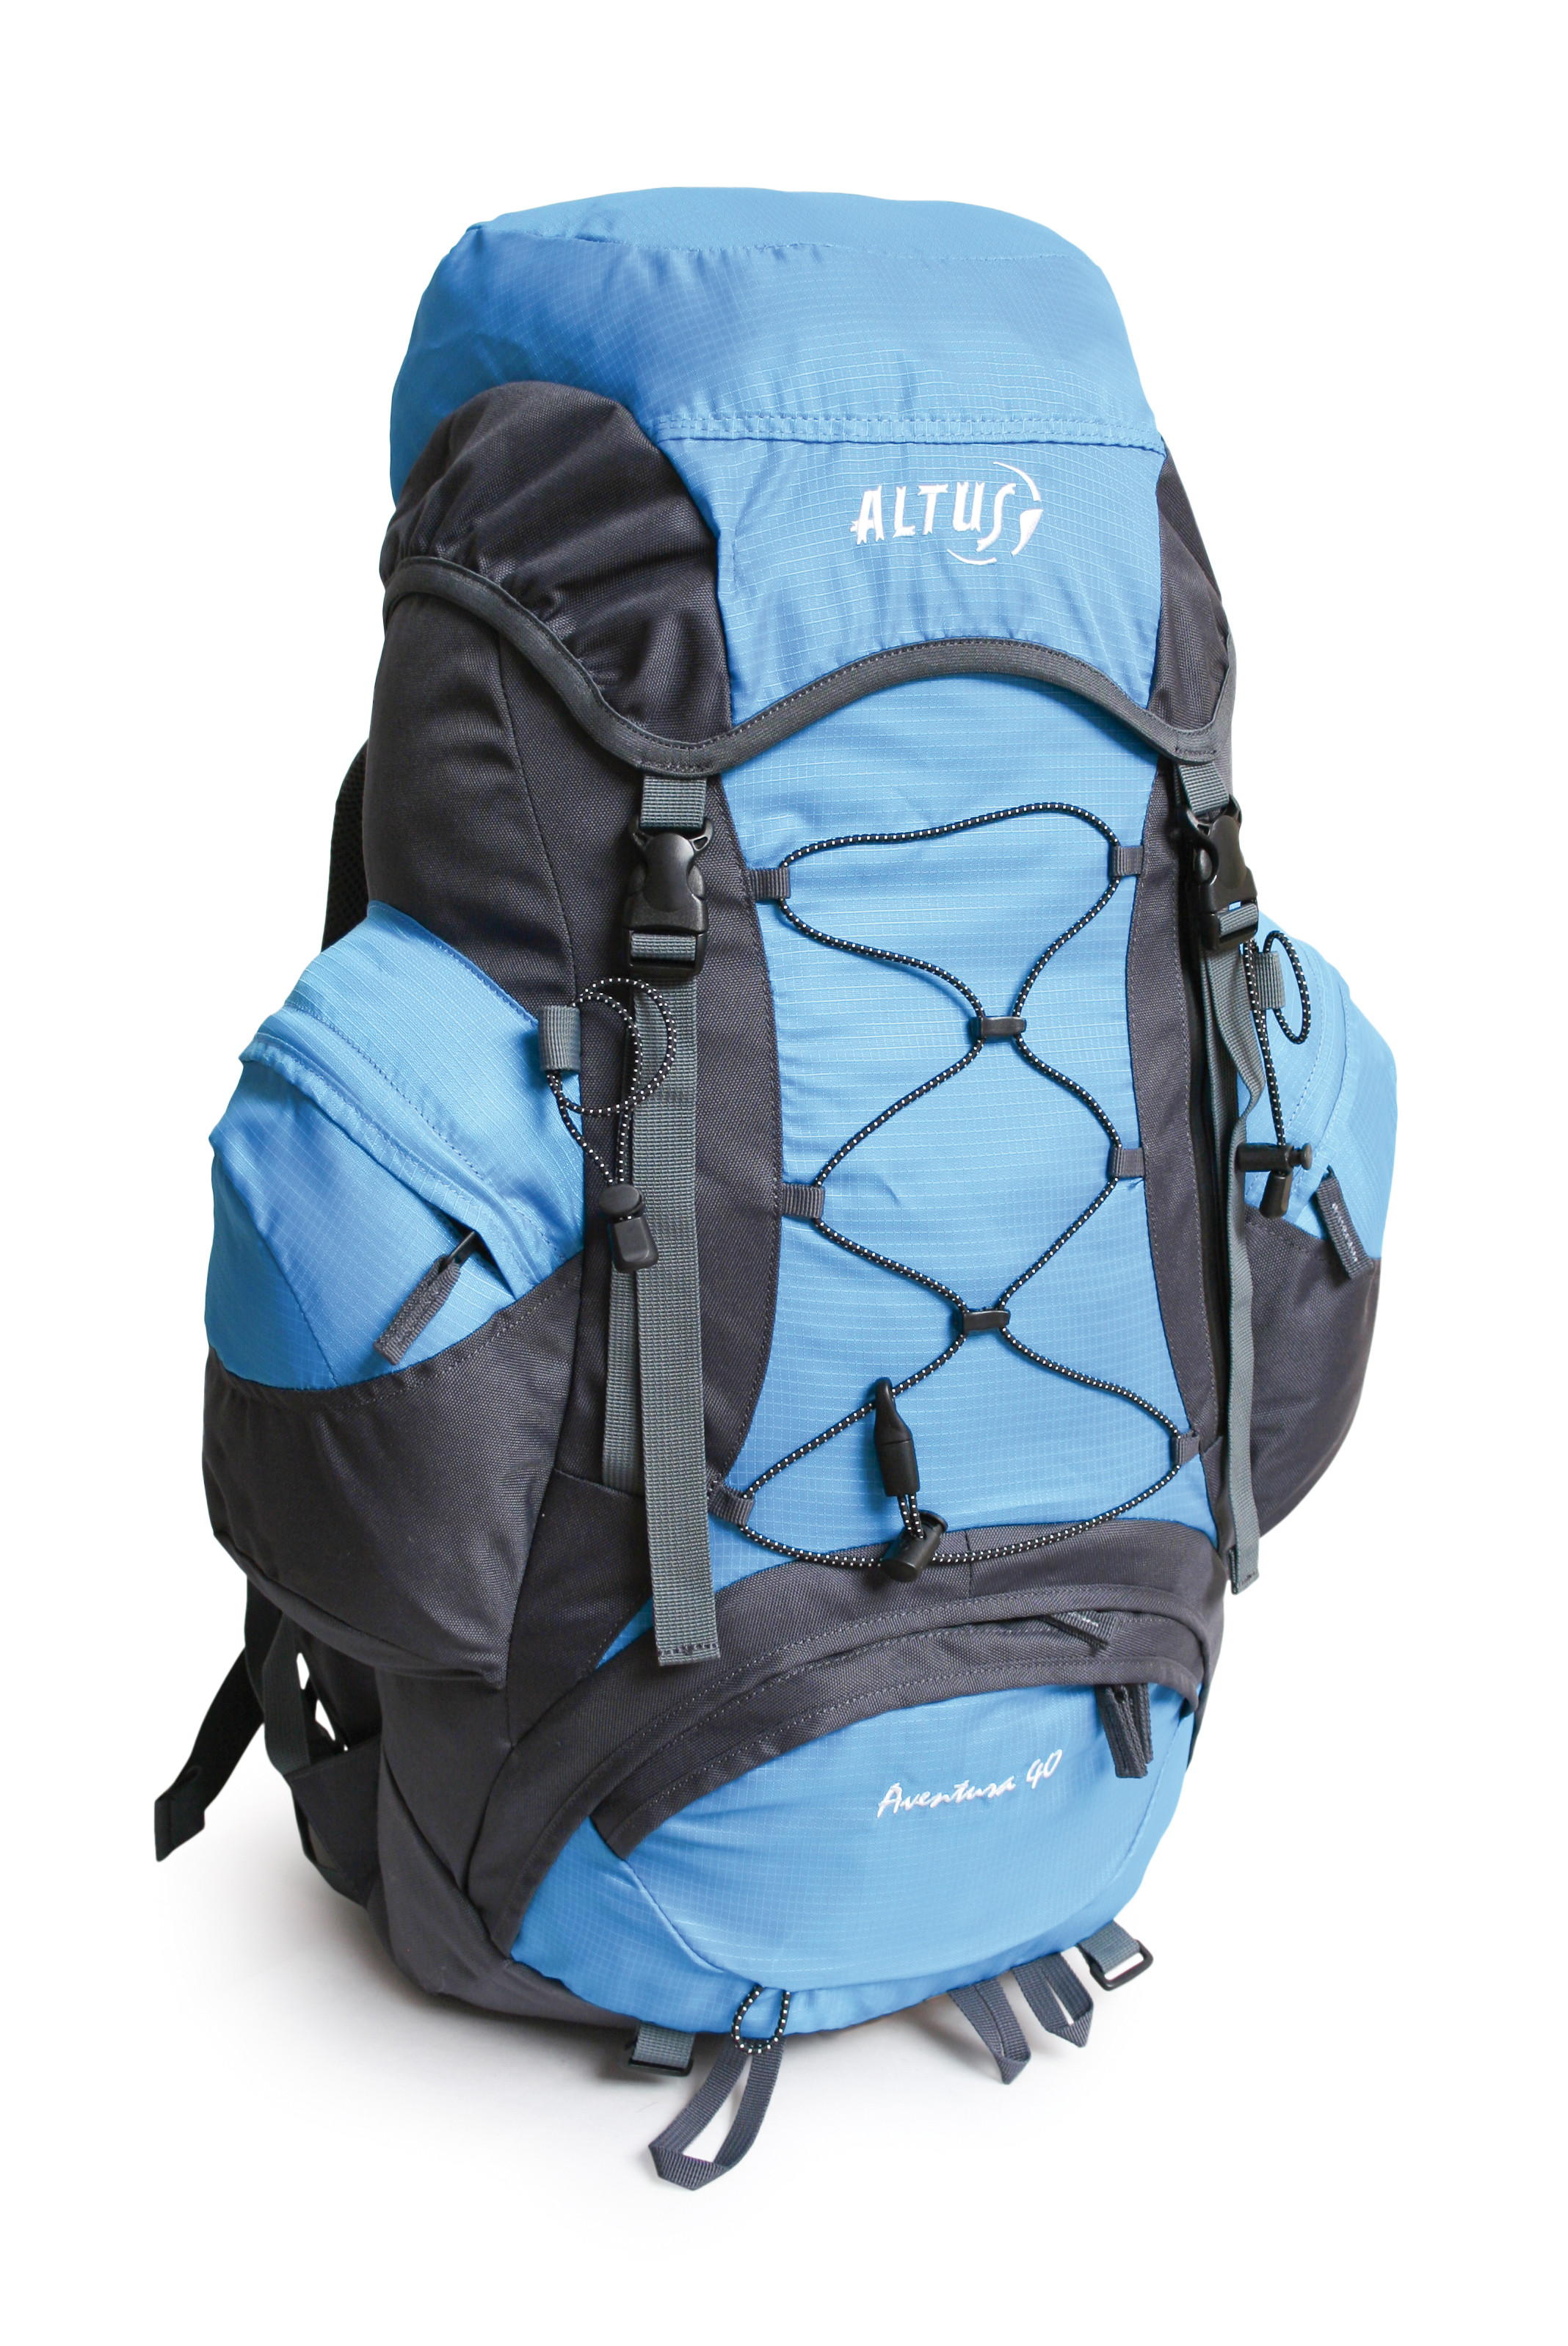 Mochila Aventura 40L altus azul